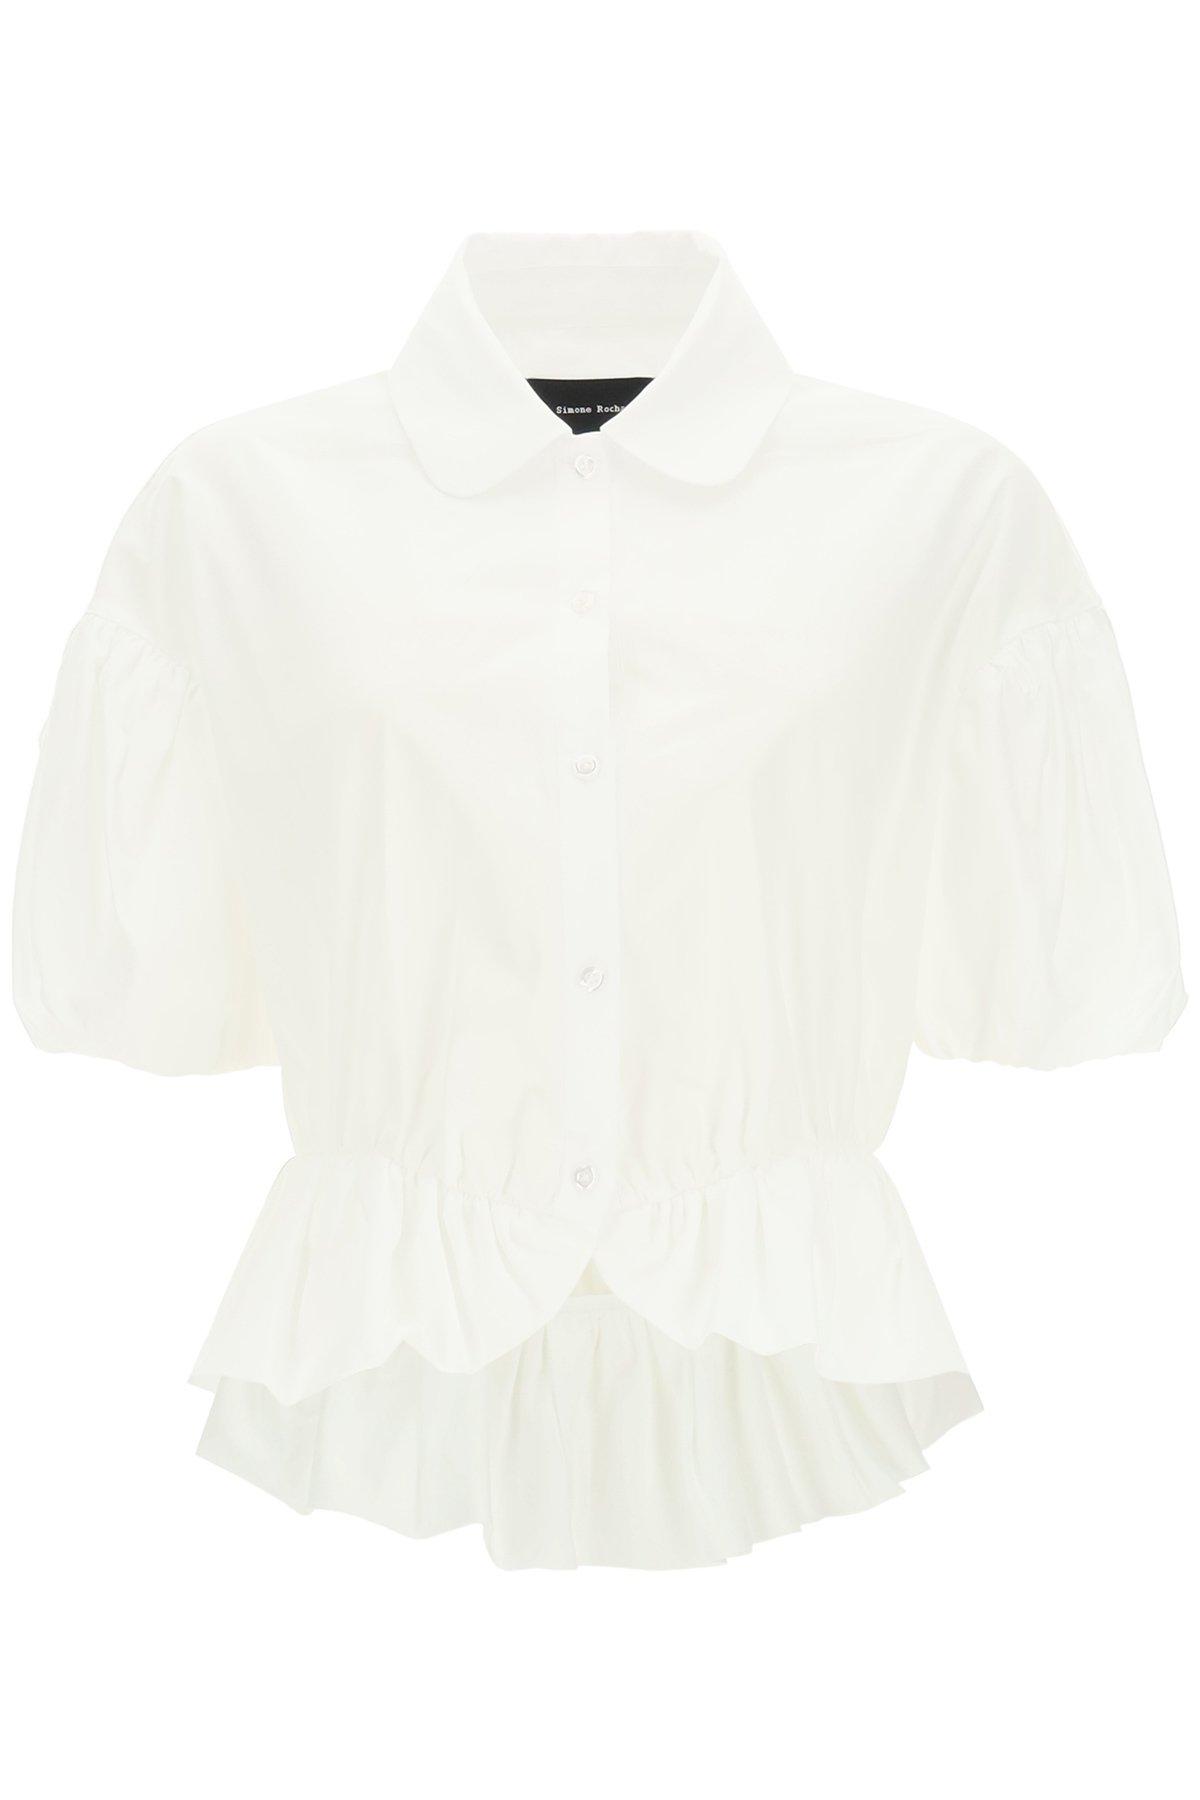 Simone rocha camicia peplum